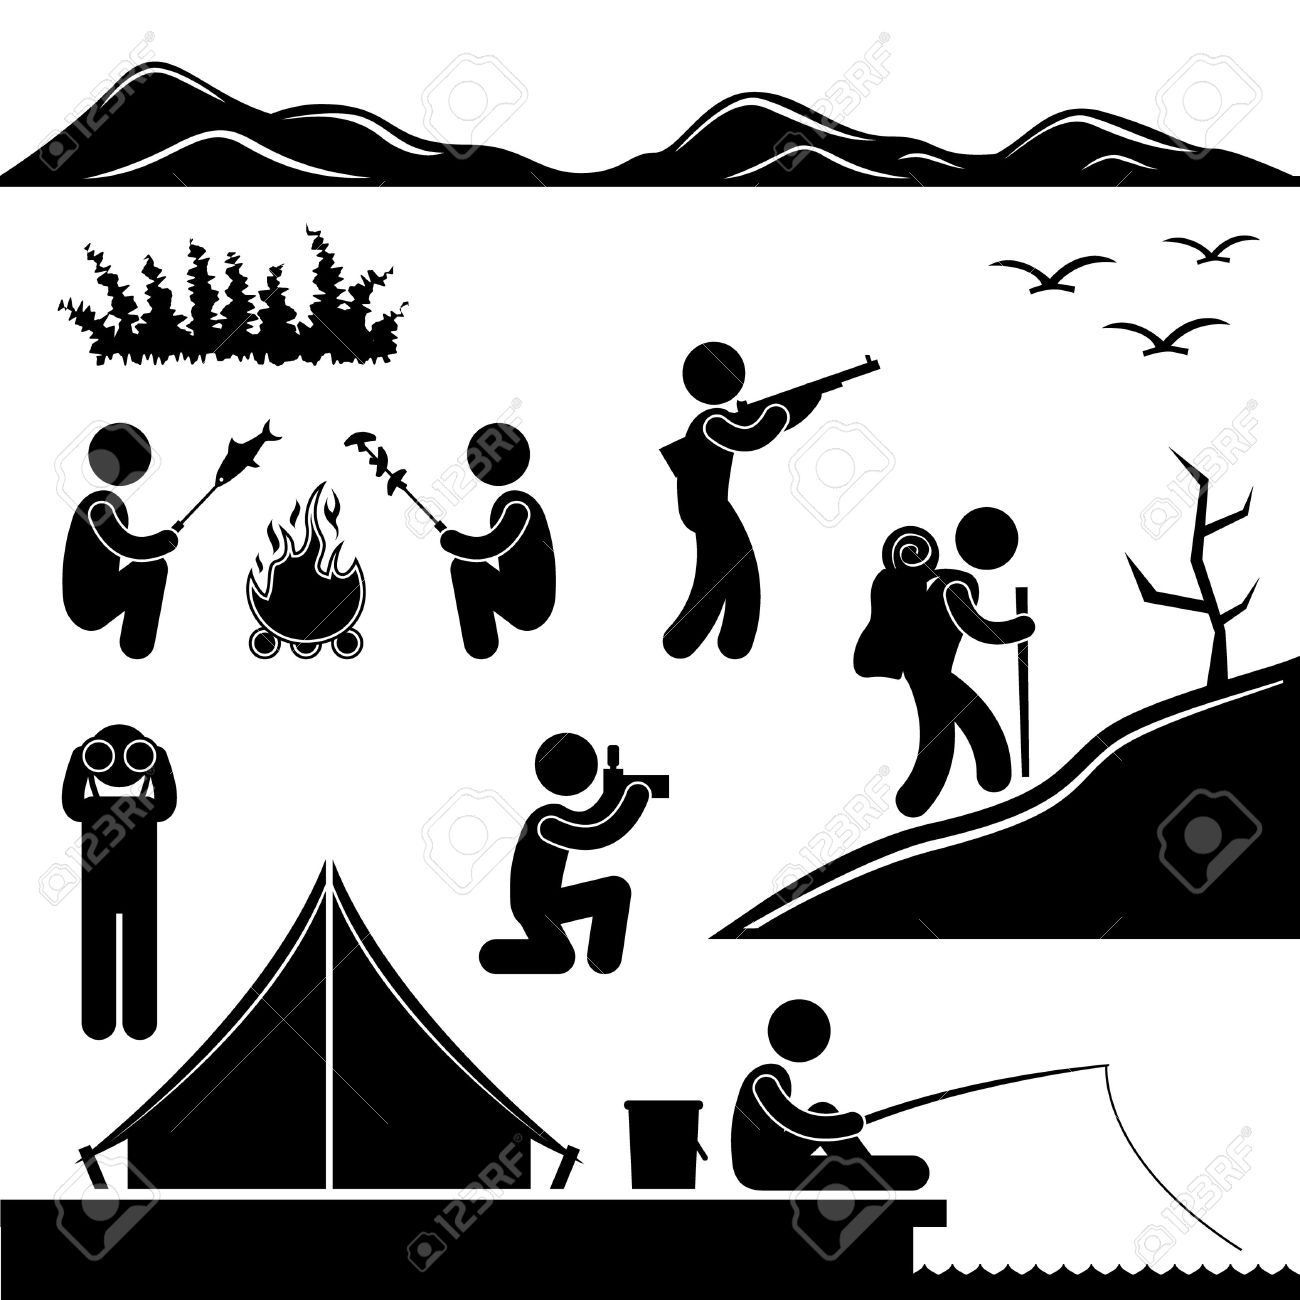 Jungle Trekking Hiking Camping Campfire Adventure Stock Vector - 11102679